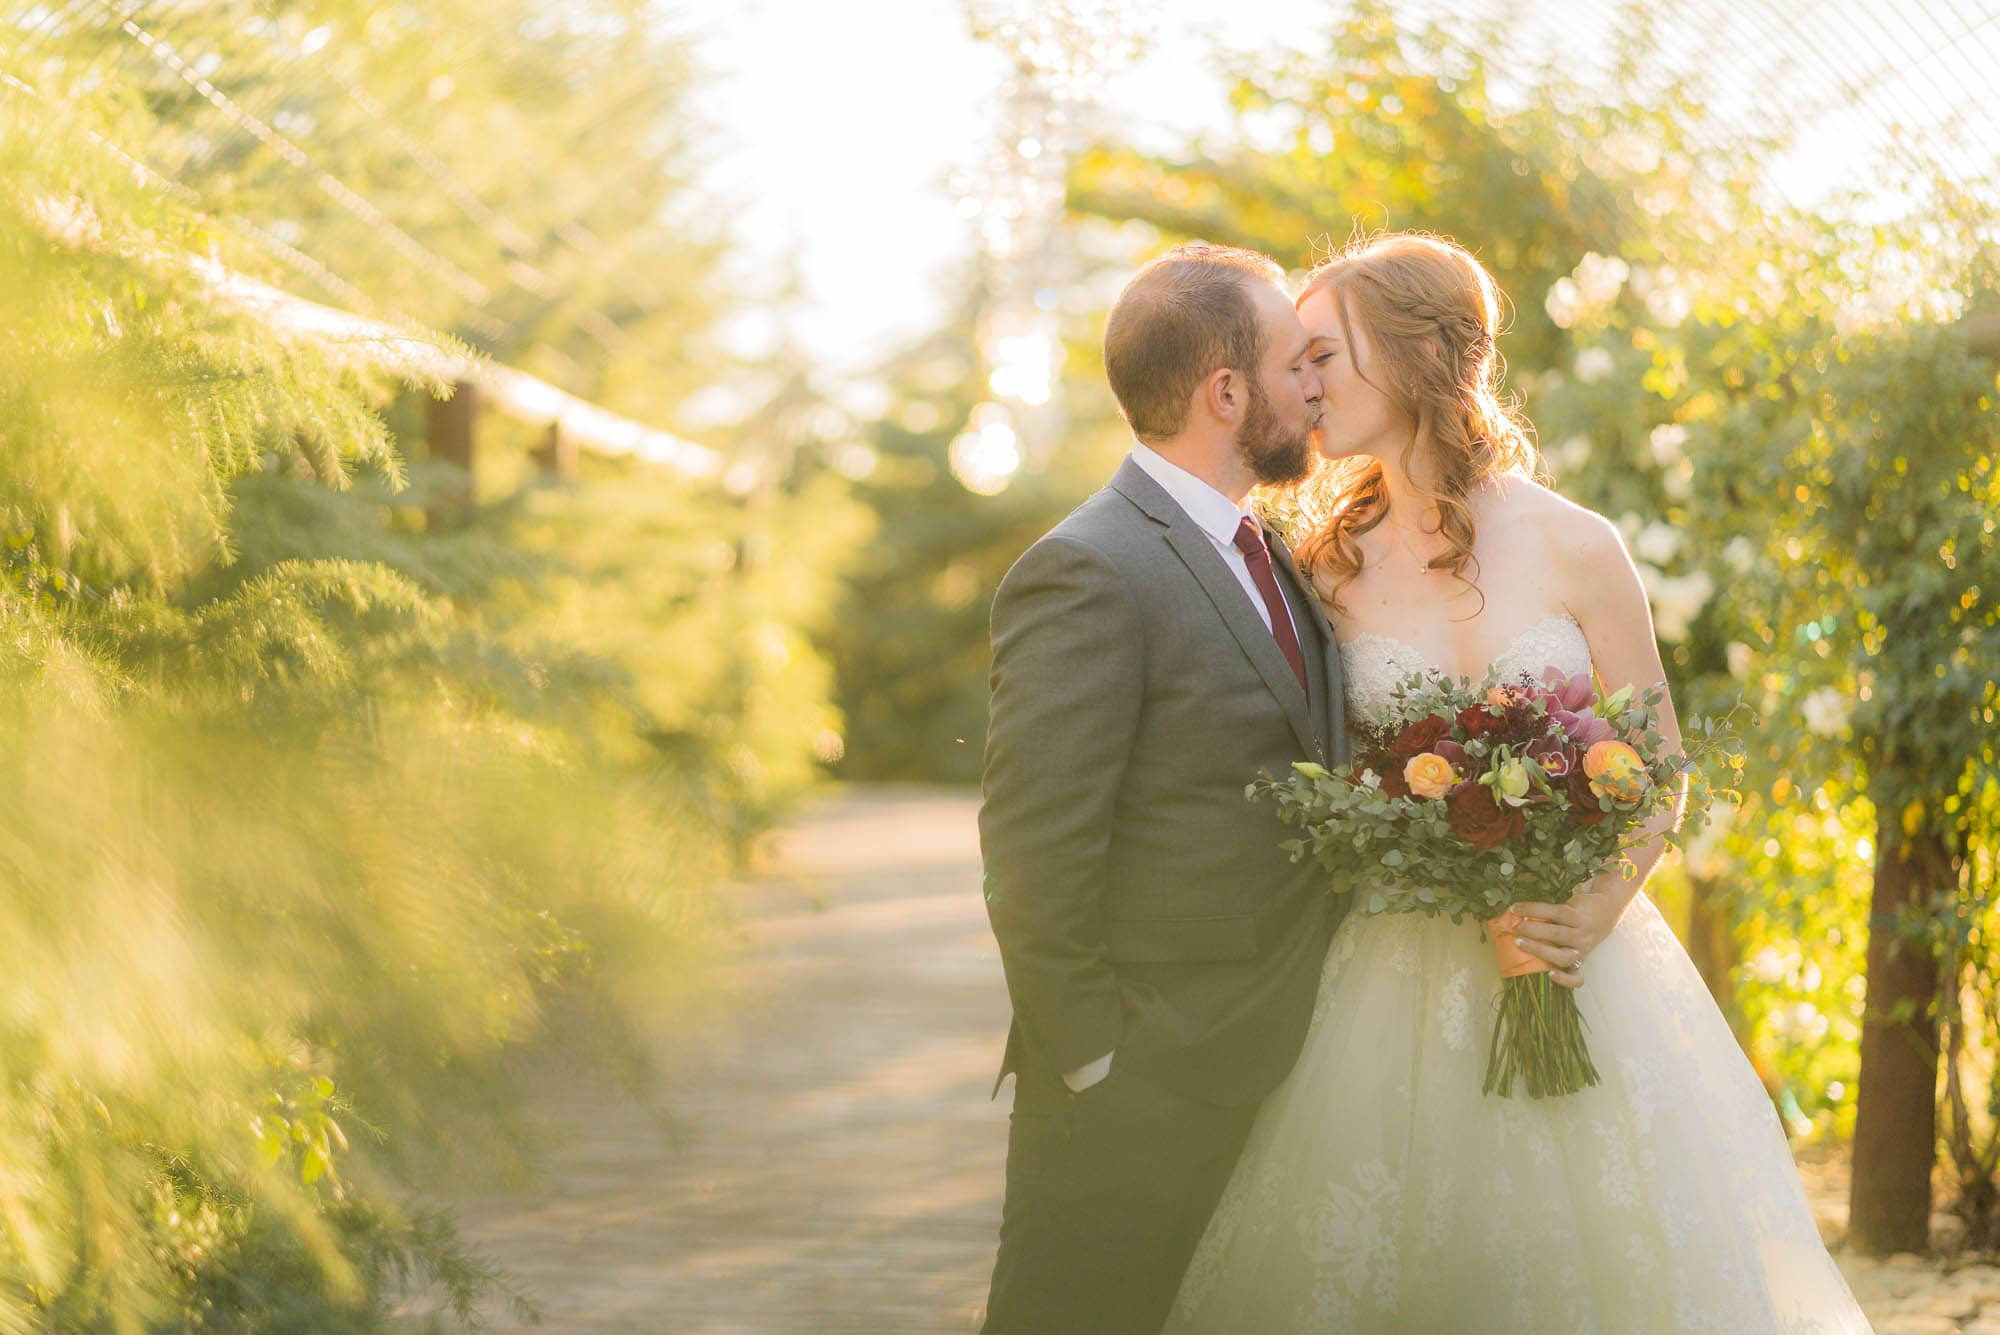 442_Alan_and_Heidi_Serendipity_Garden_Wedding_10-27-2018